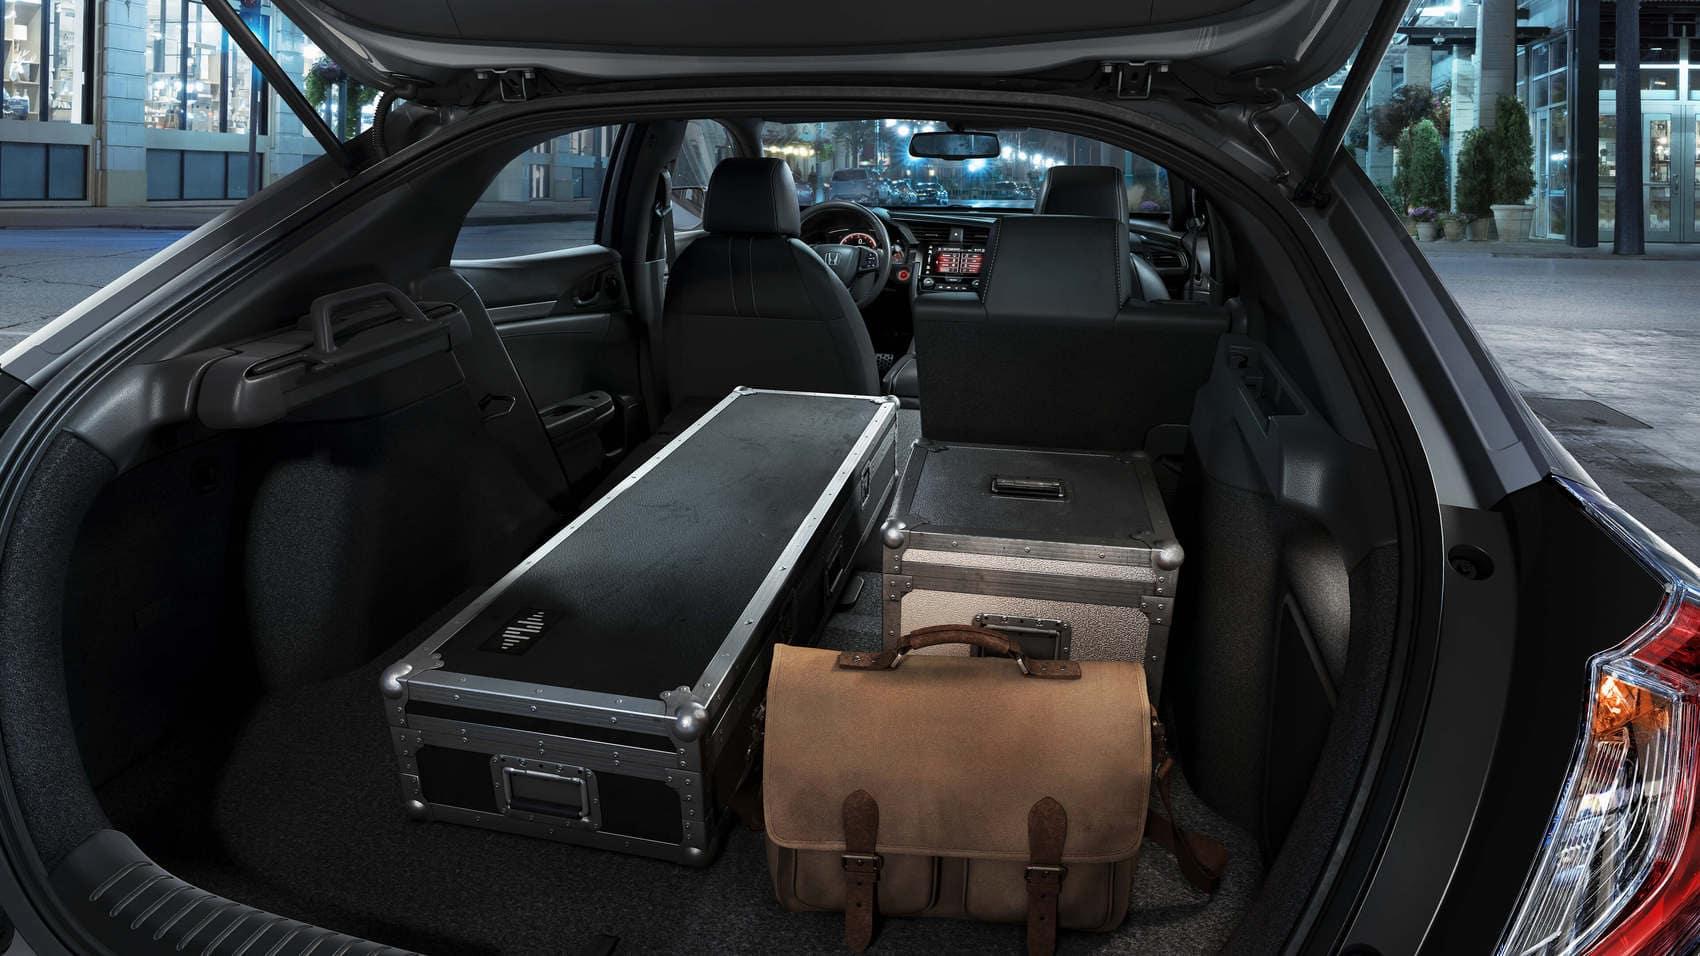 2019 Honda Civic Hatchback Cargo Space